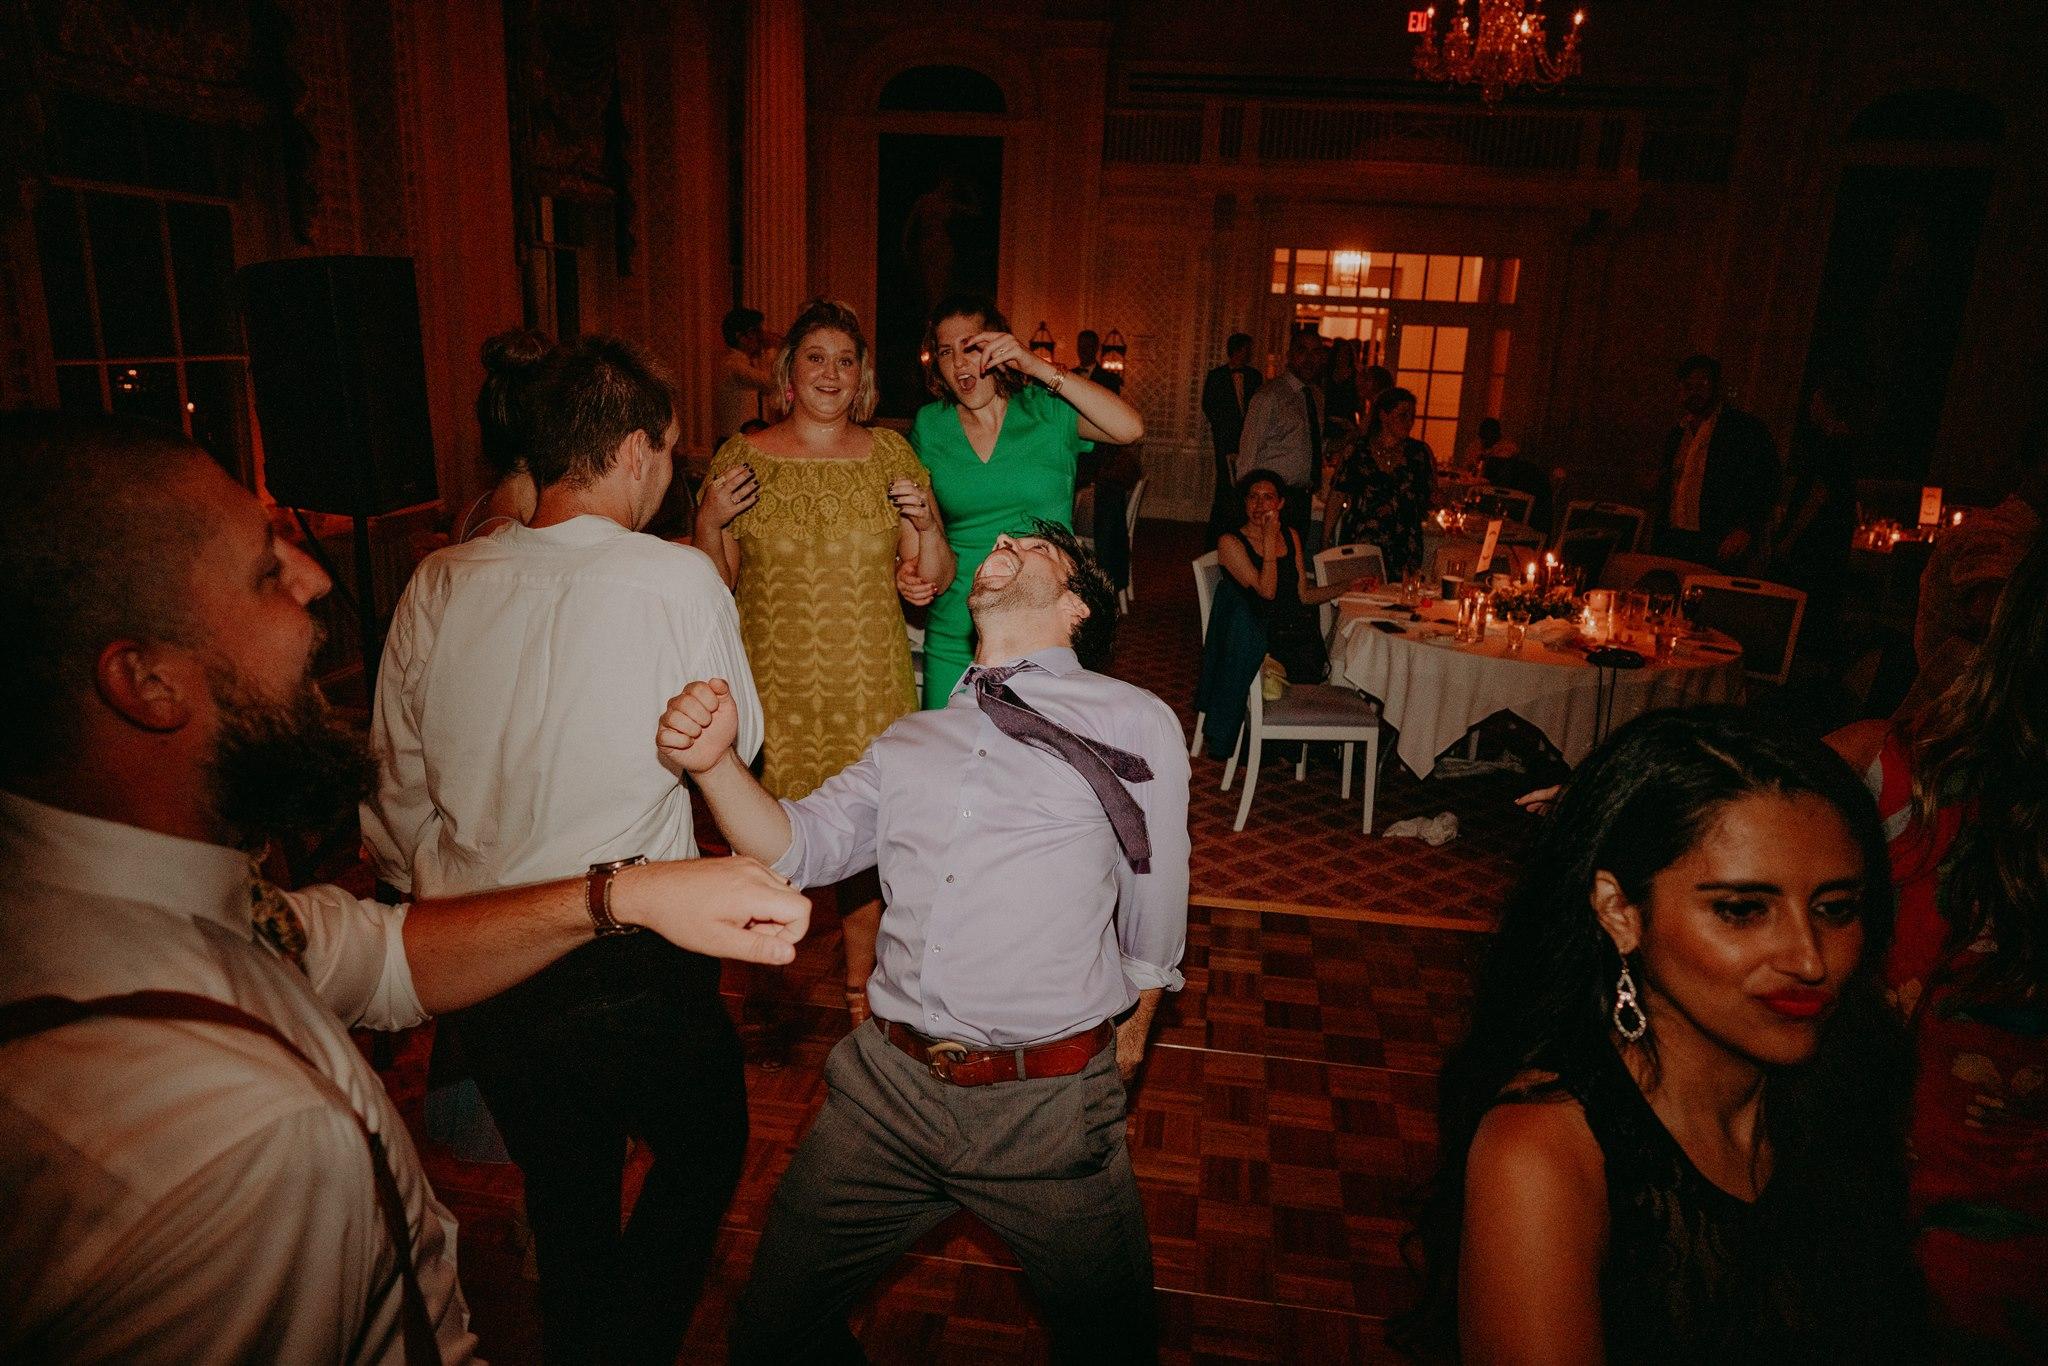 Chellise_Michael_Photography_Hudson_Valley_Wedding_Photographer_Otesaga_Hotel-6267.jpg